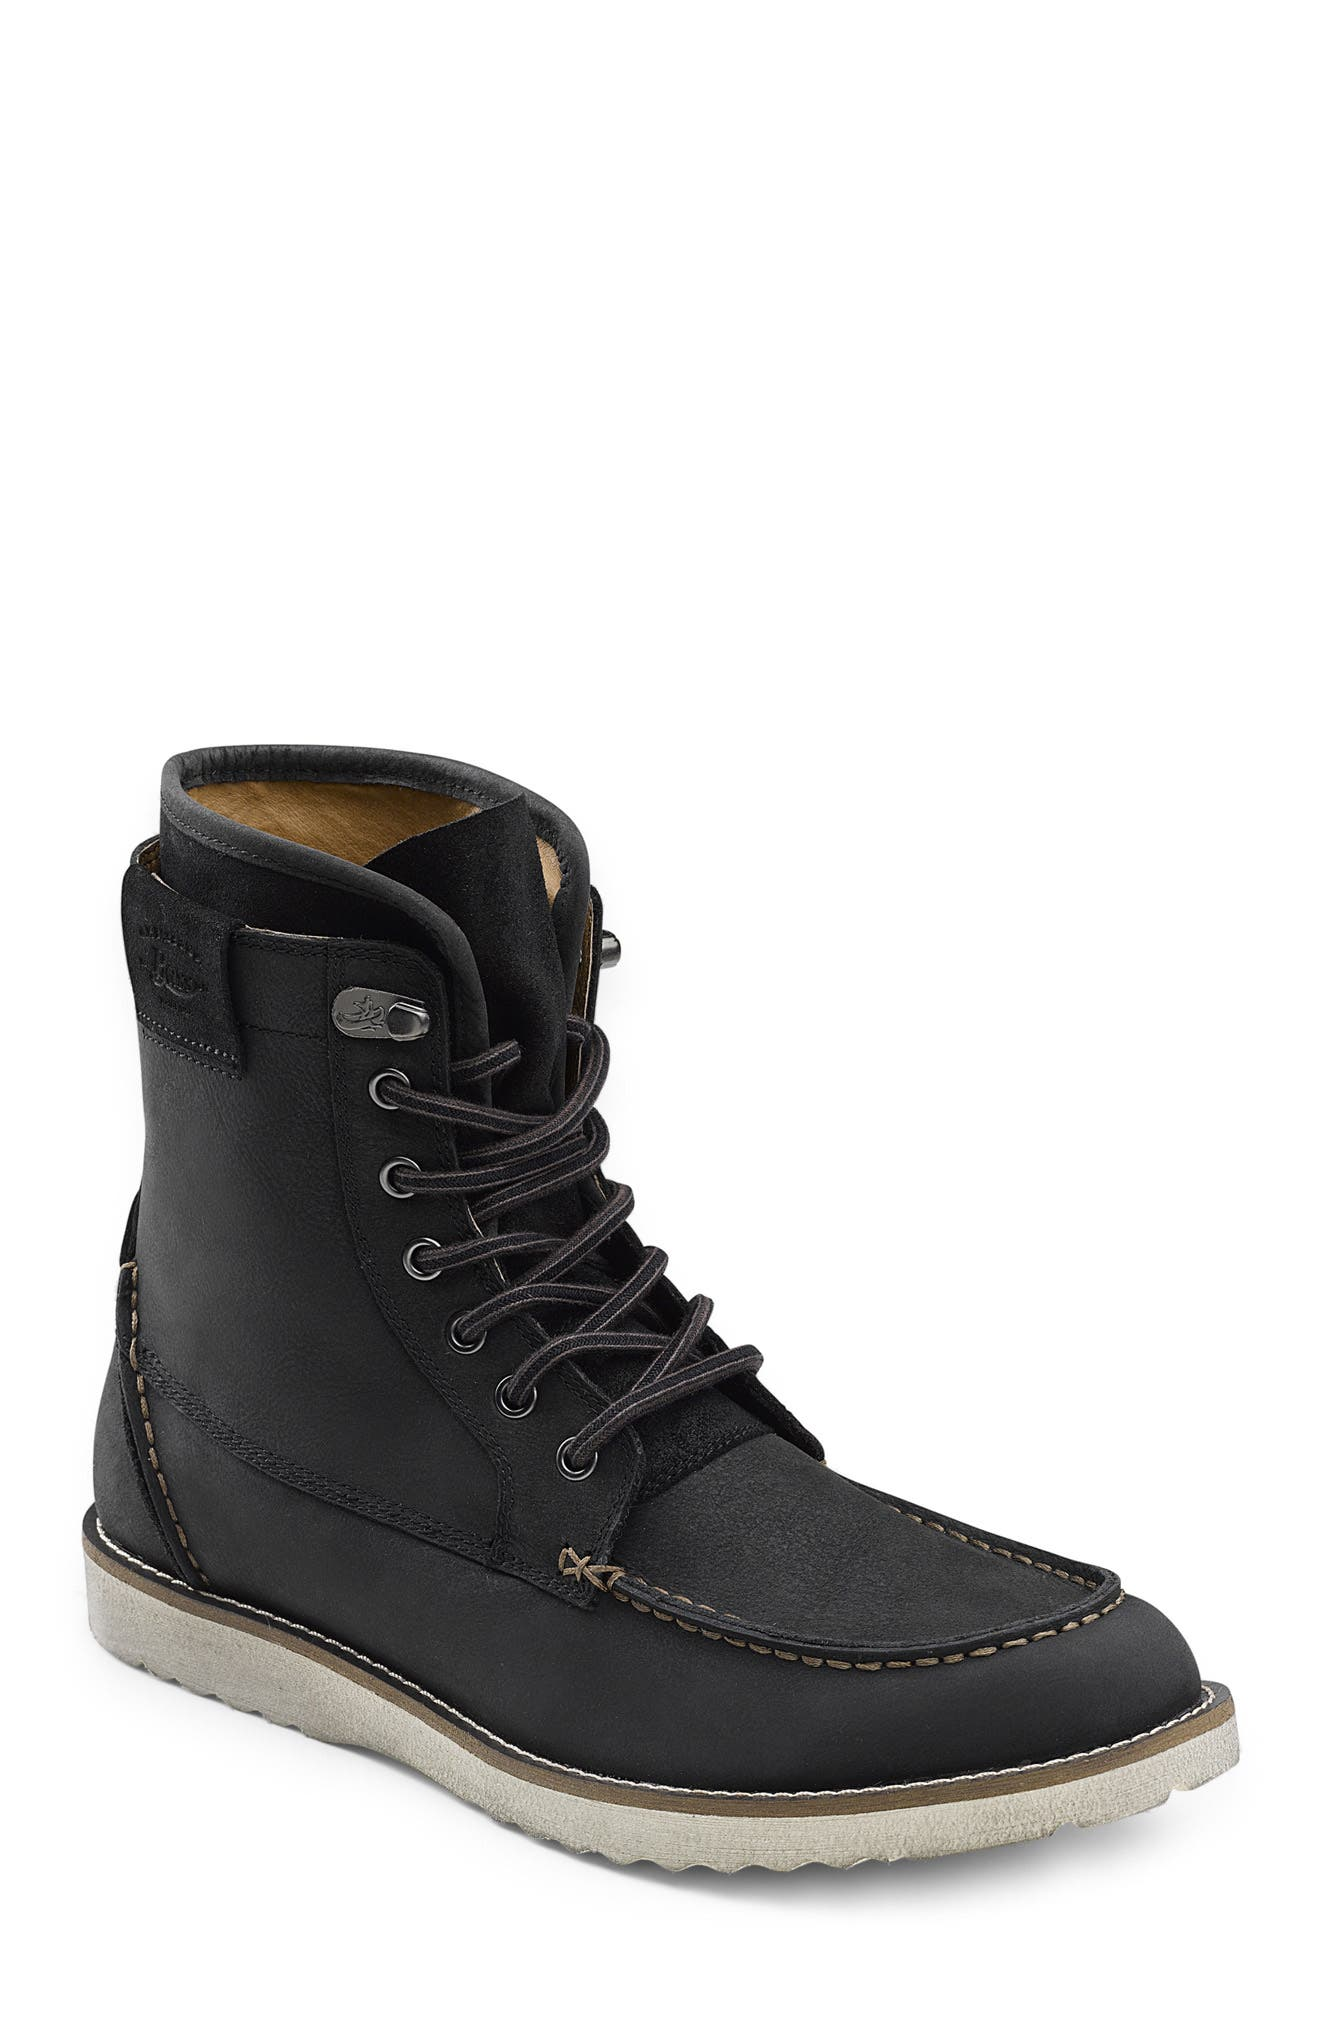 Shane Moc Toe Boot,                         Main,                         color, Black